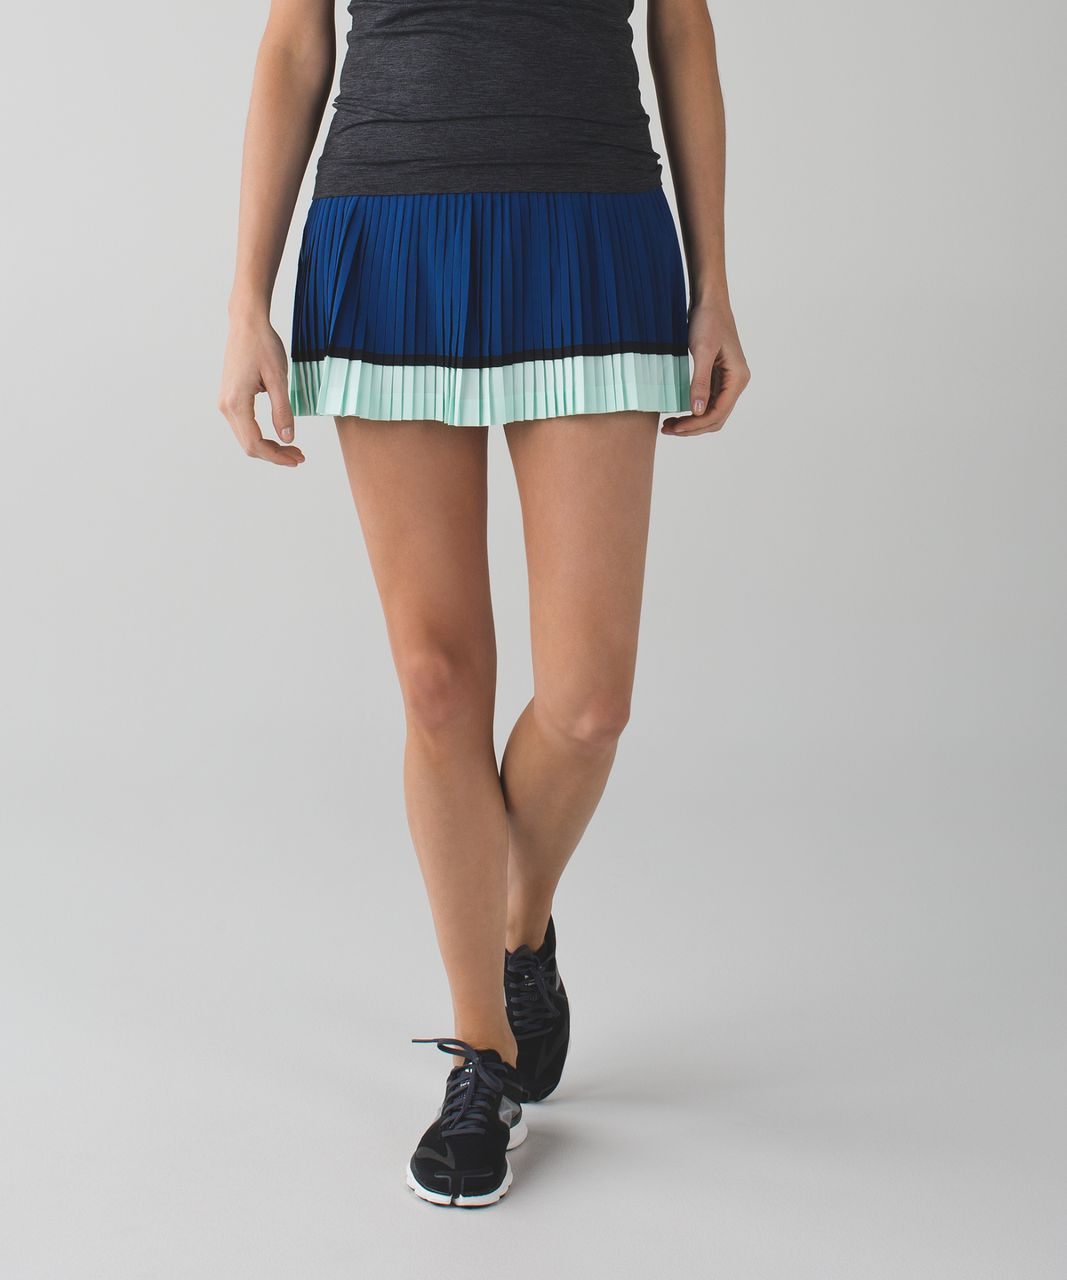 ce99848711 Lululemon Pleat To Street Skirt II - Poseidon / Sea Mist - lulu fanatics